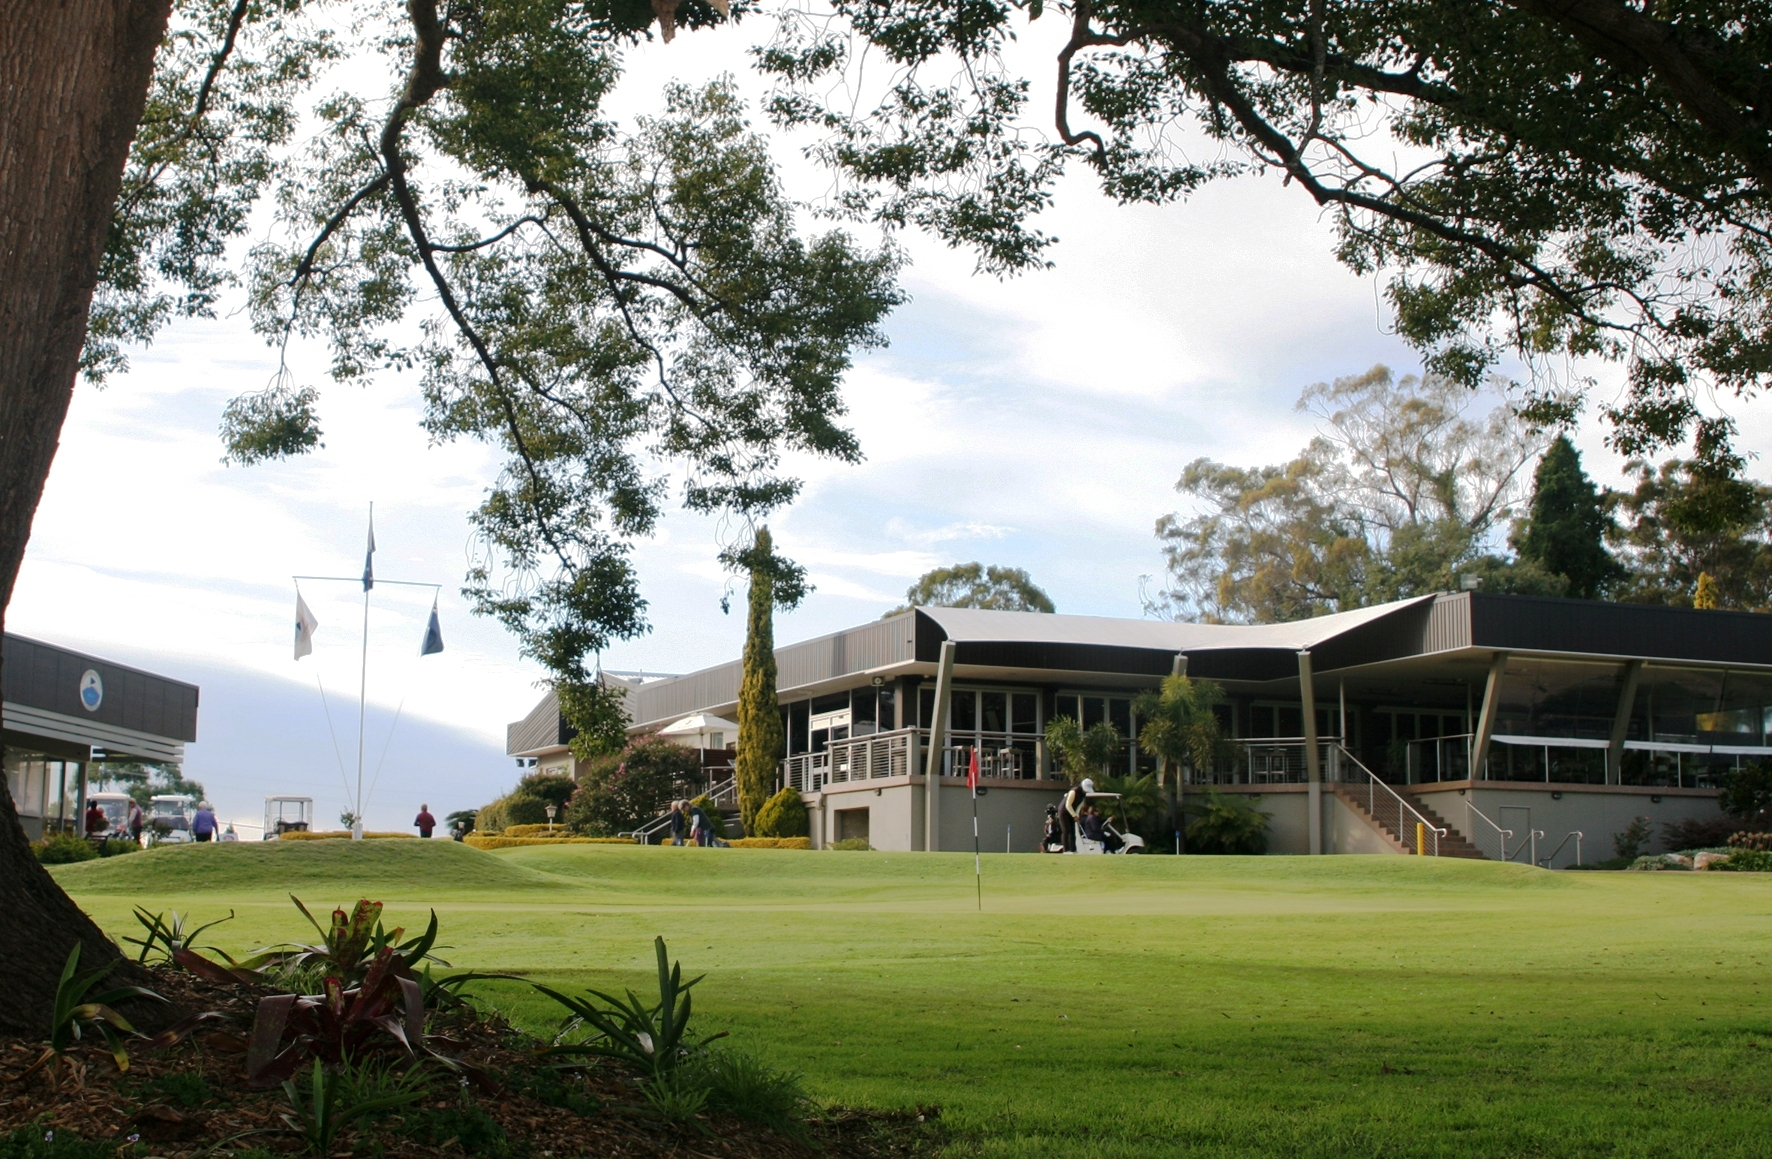 Toowoomba Golf Club